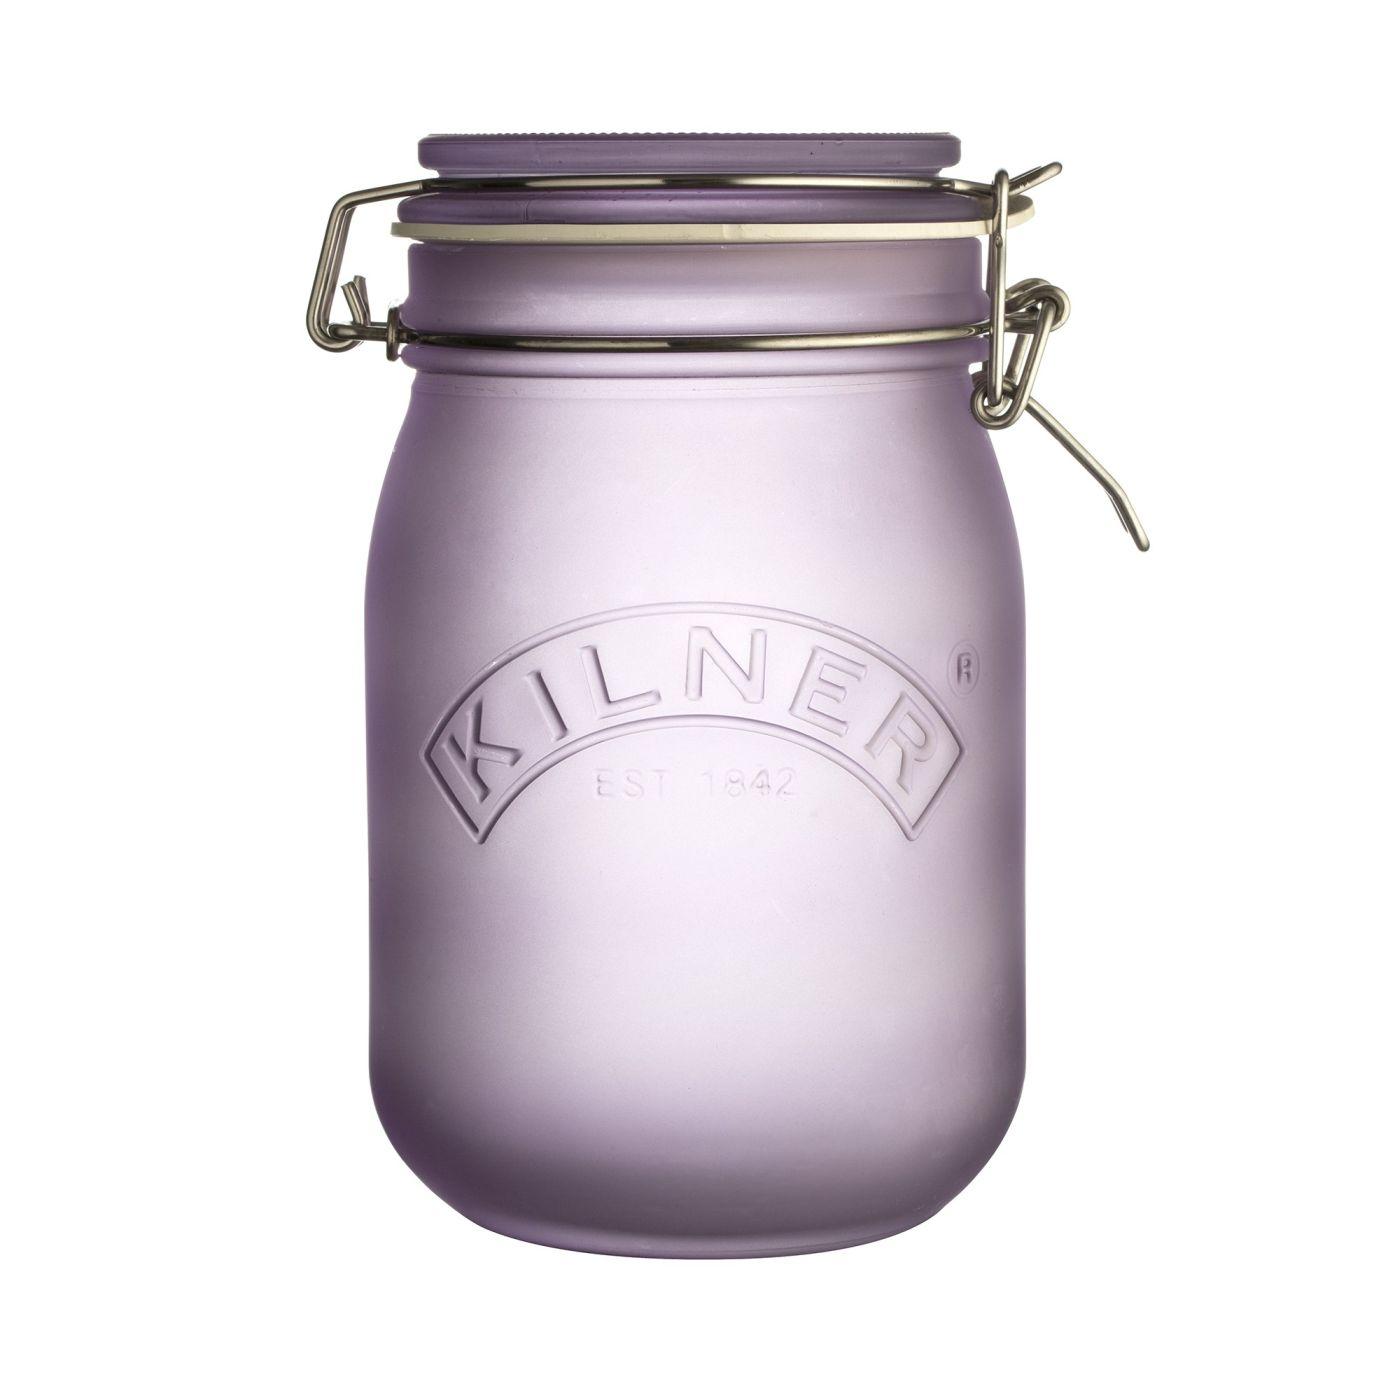 KILNER zavařovací sklenice s klipem 1 l fialová - Kilner